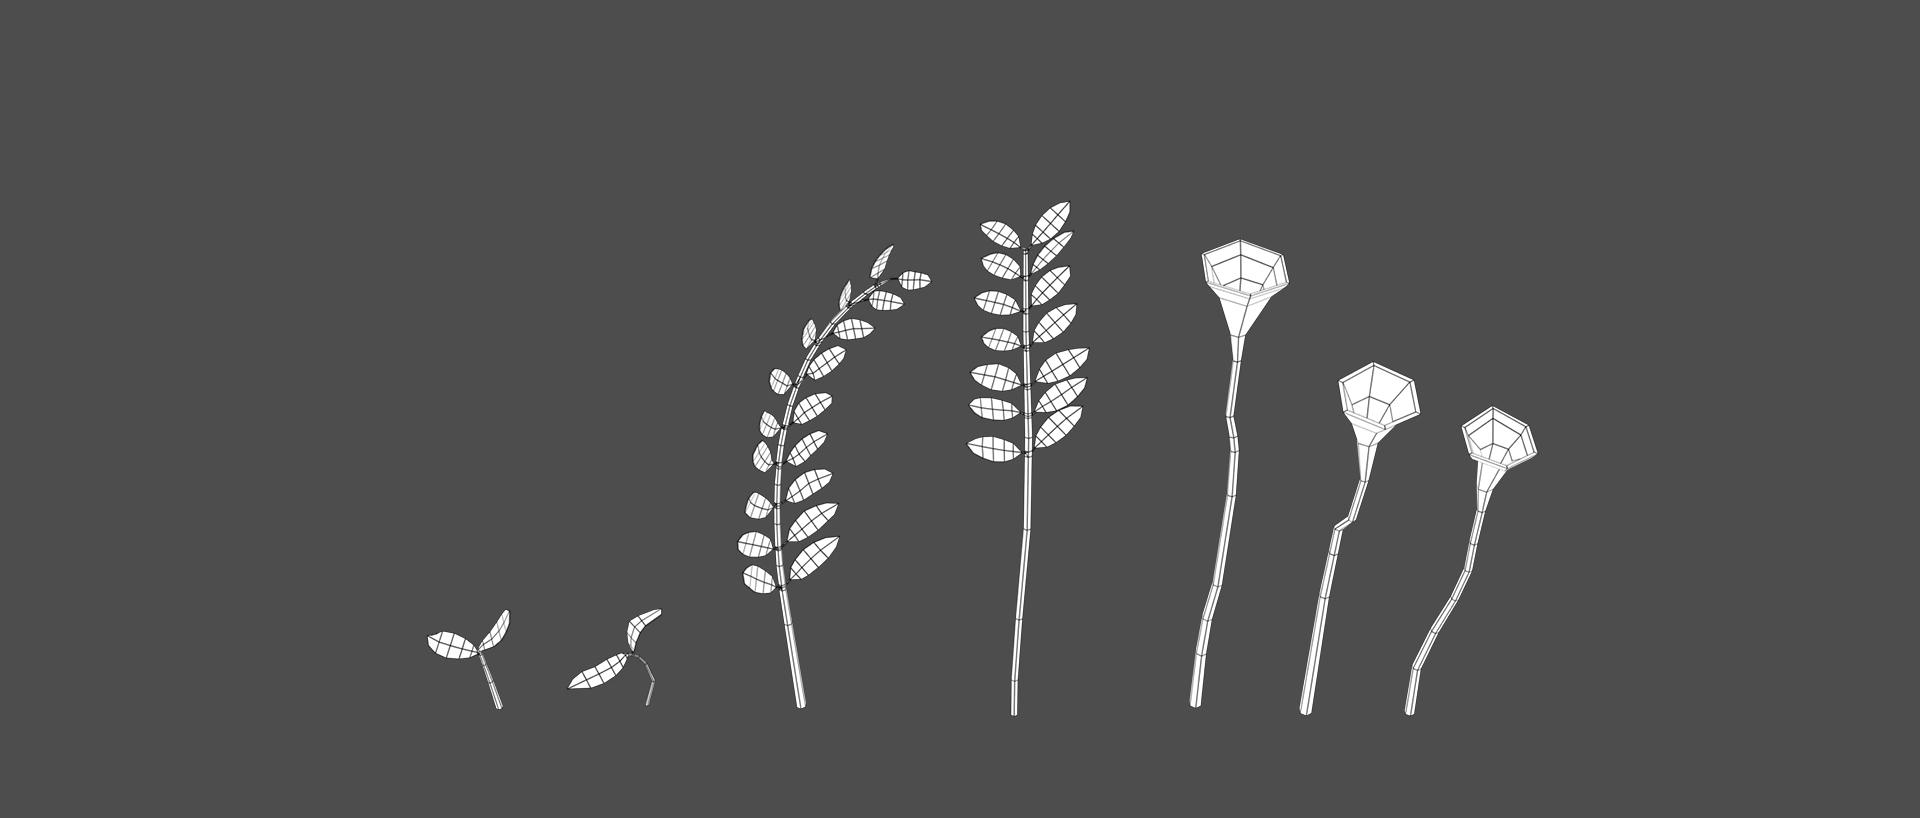 smallplants03.jpg